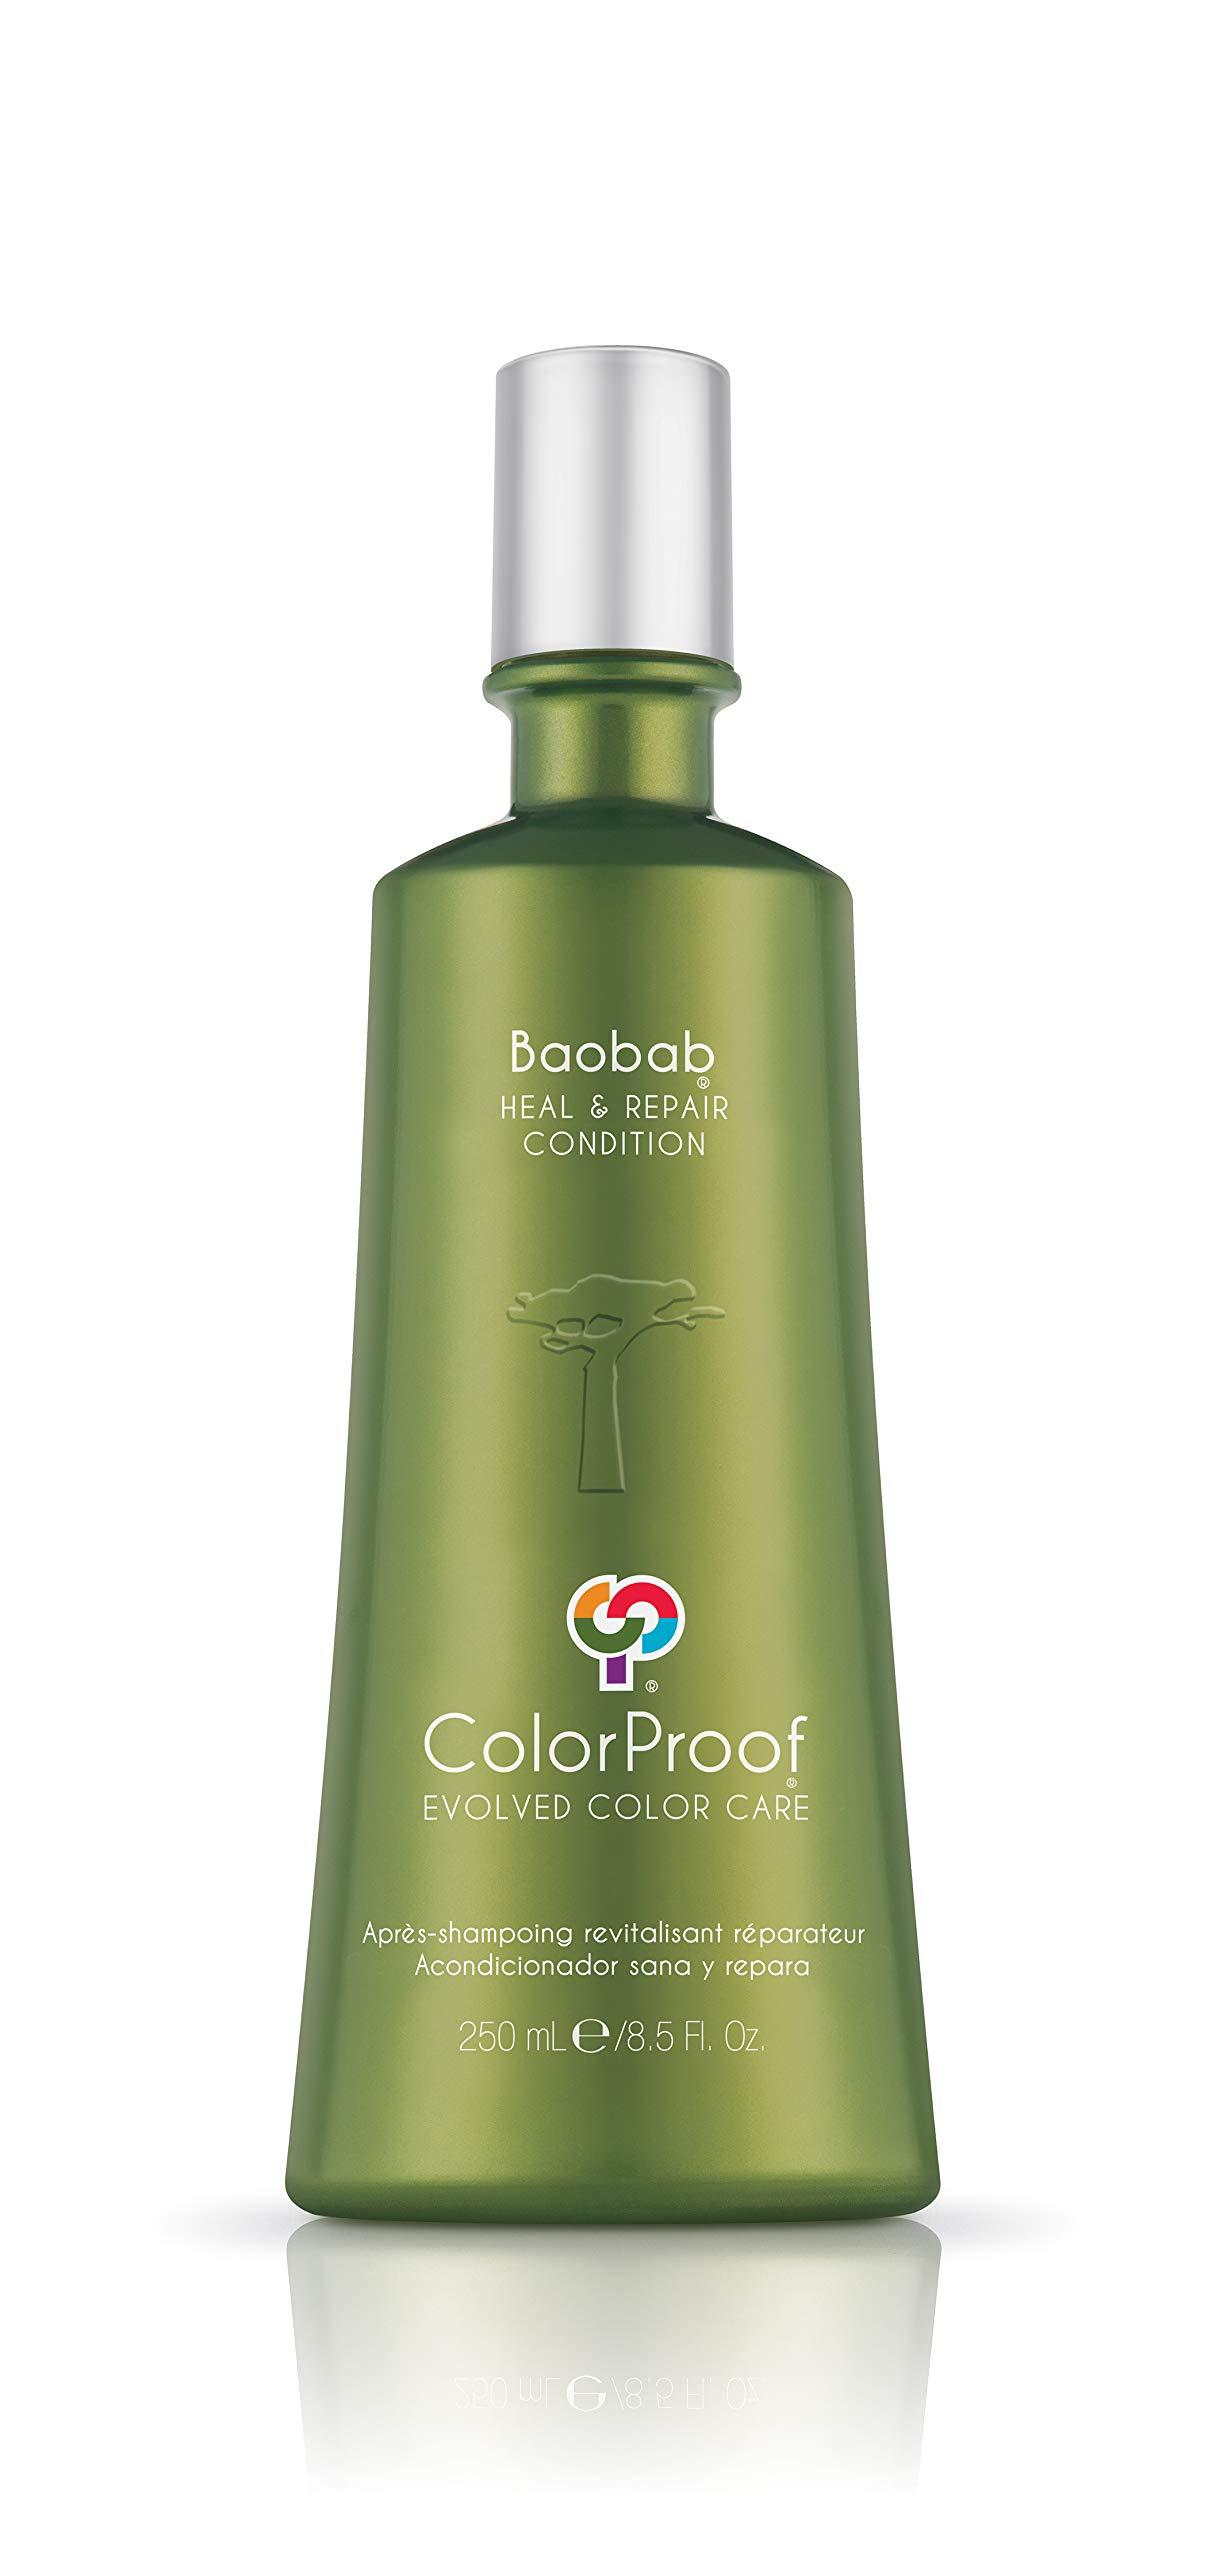 ColorProof Baobab Heal & Repair Condition, 8.5oz